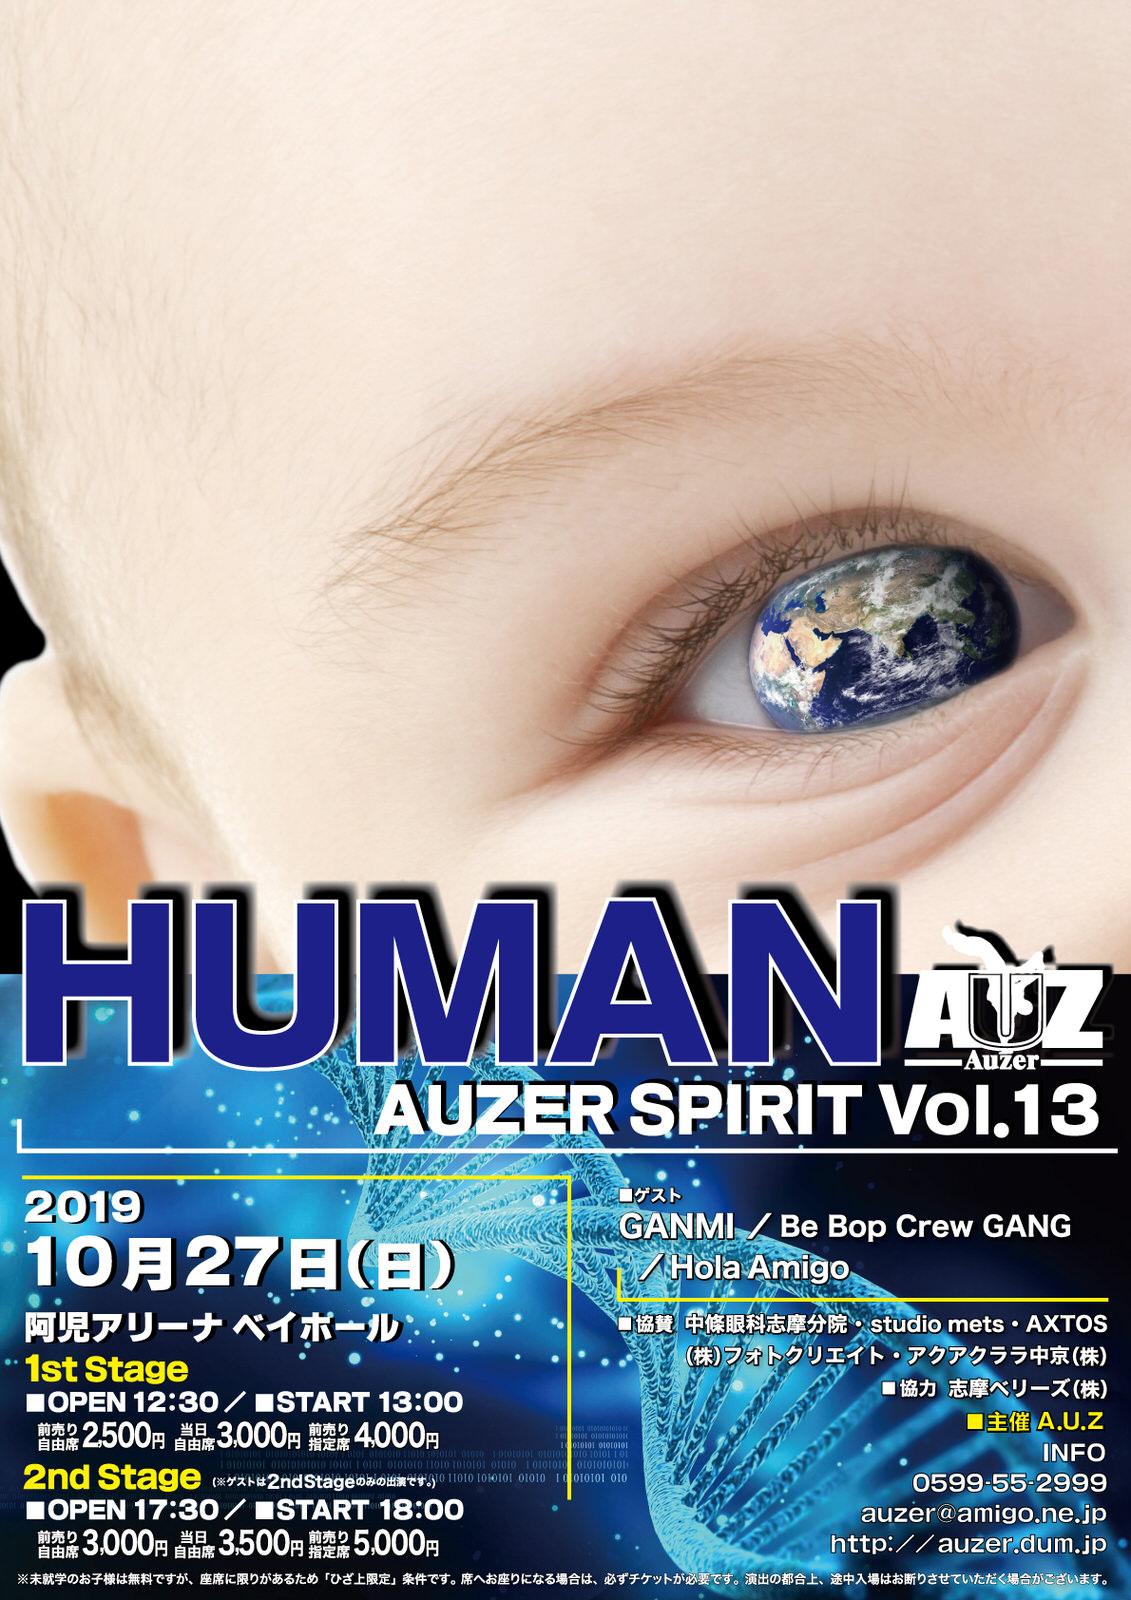 AuzerSpiritVol.13 HUMAN